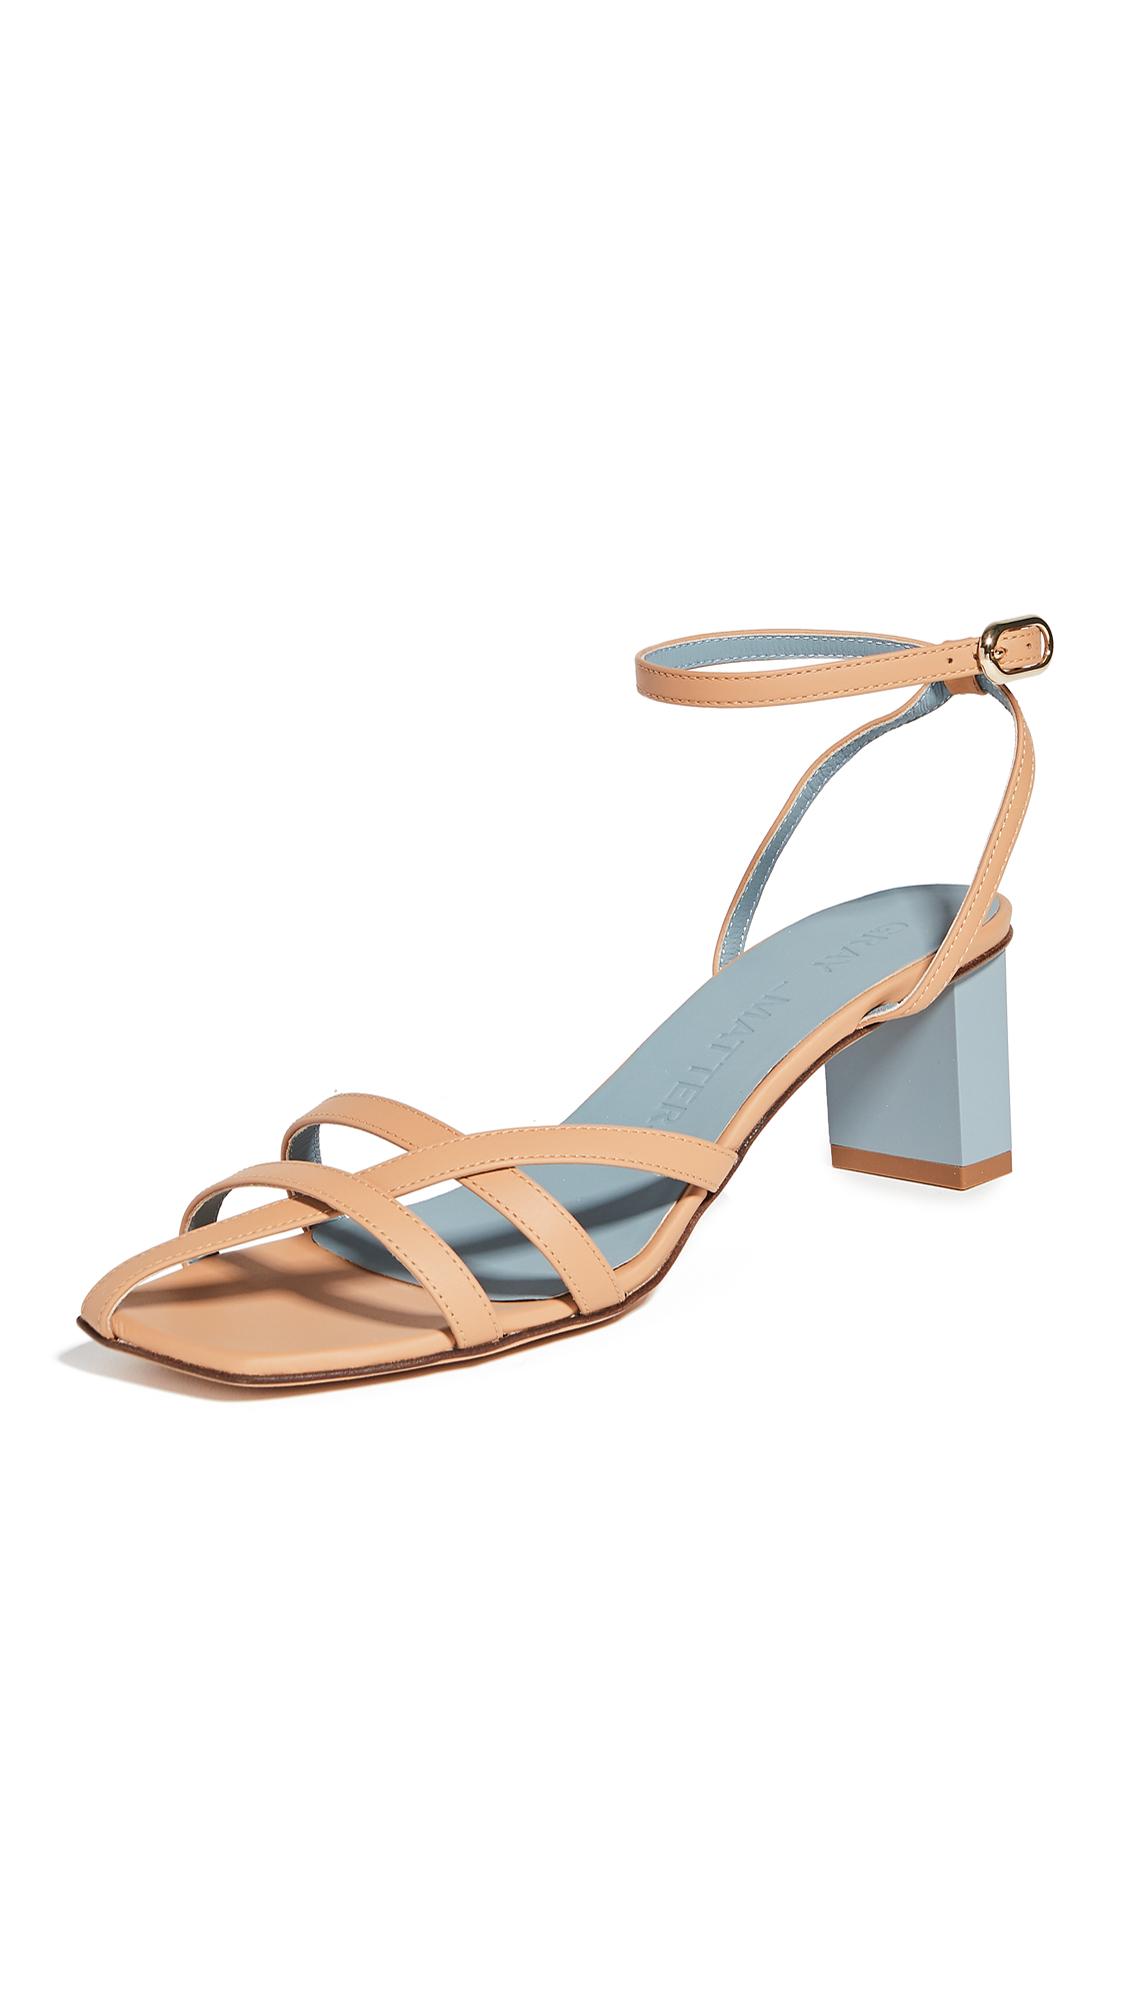 Buy Gray Matters Mia Sandals online, shop Gray Matters